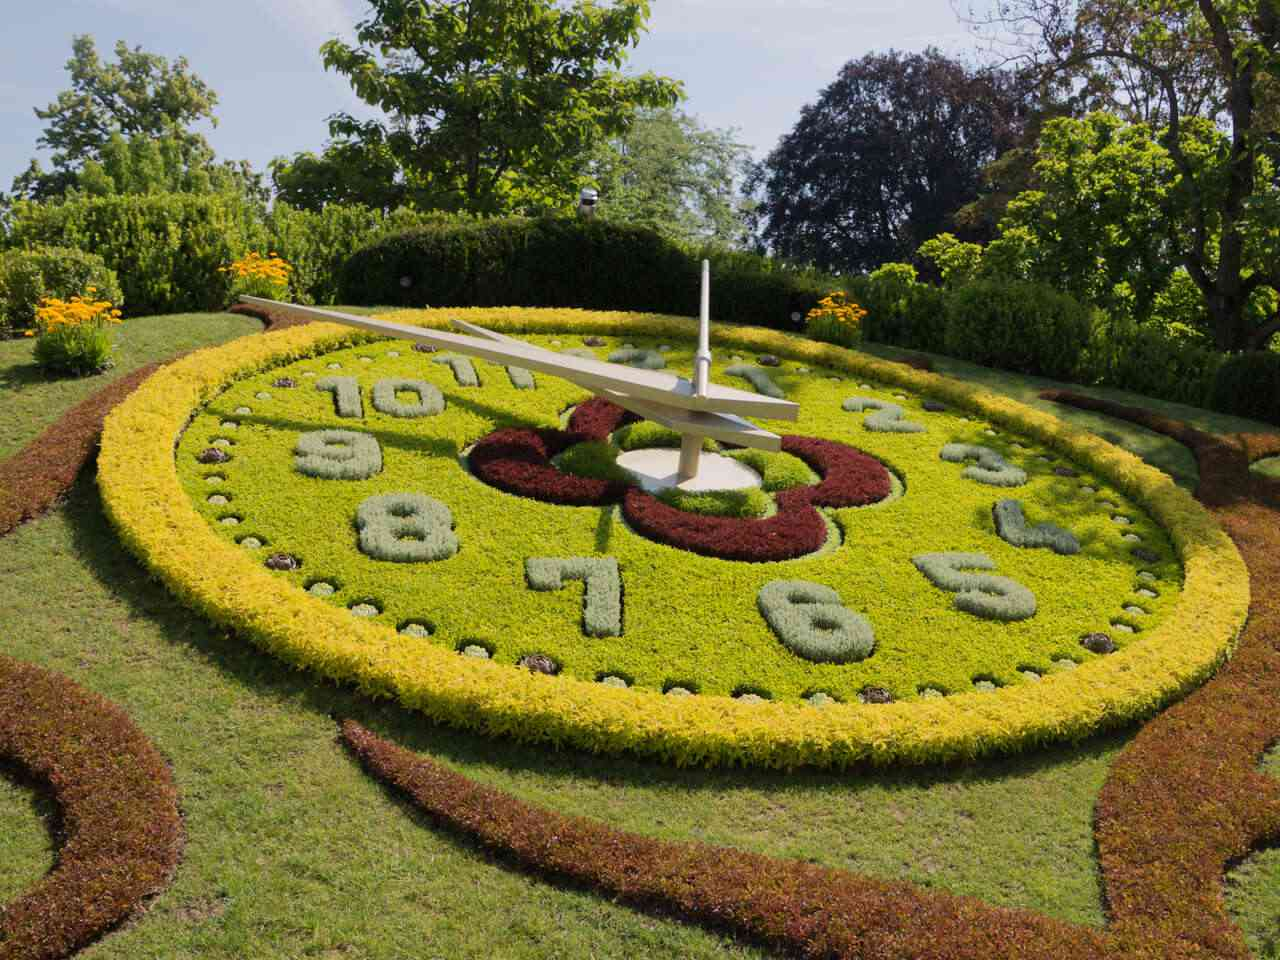 The Flower Clock at the Jardin Anglais, Geneva